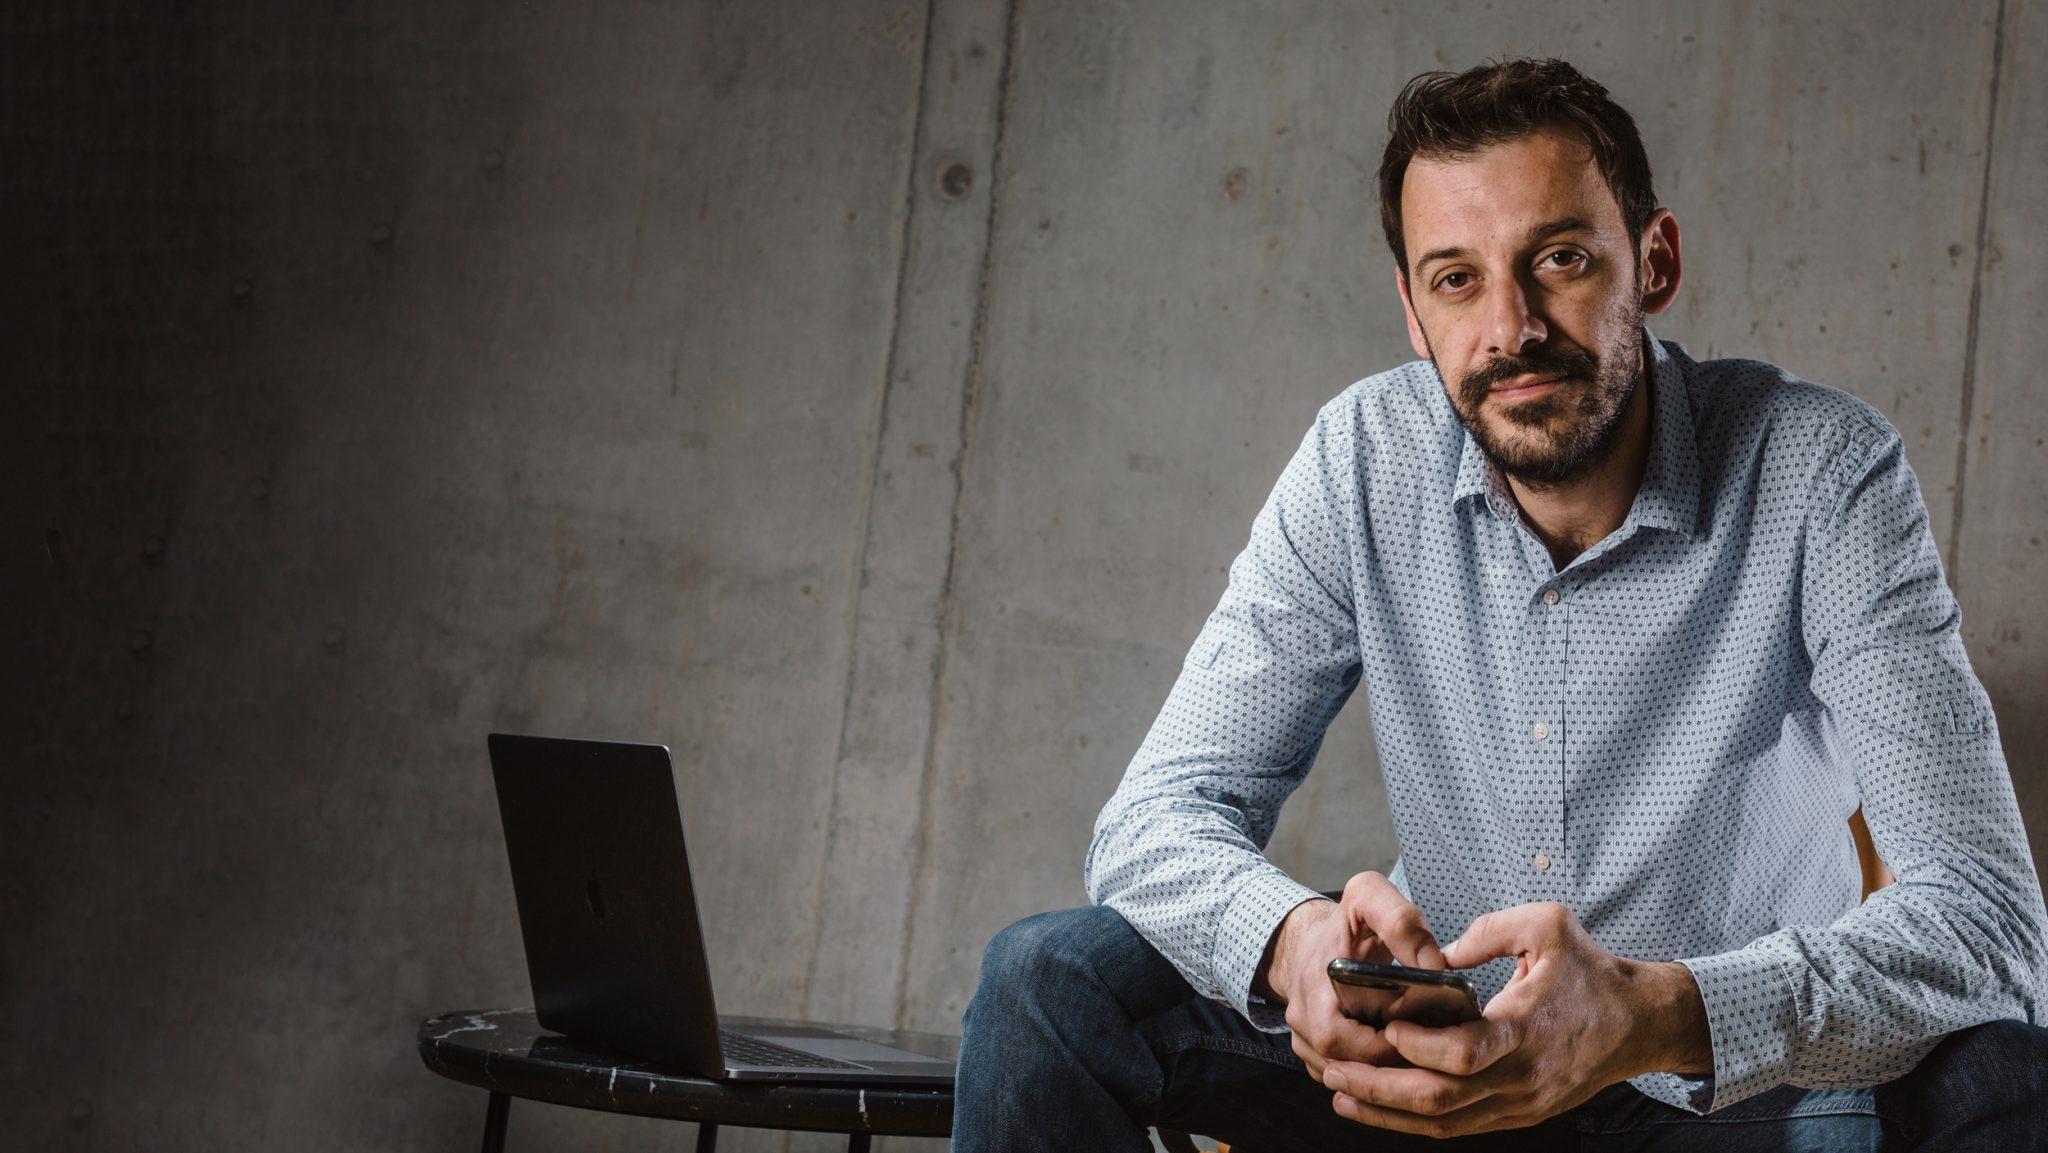 Silvio Kutic, CEO of Infobip